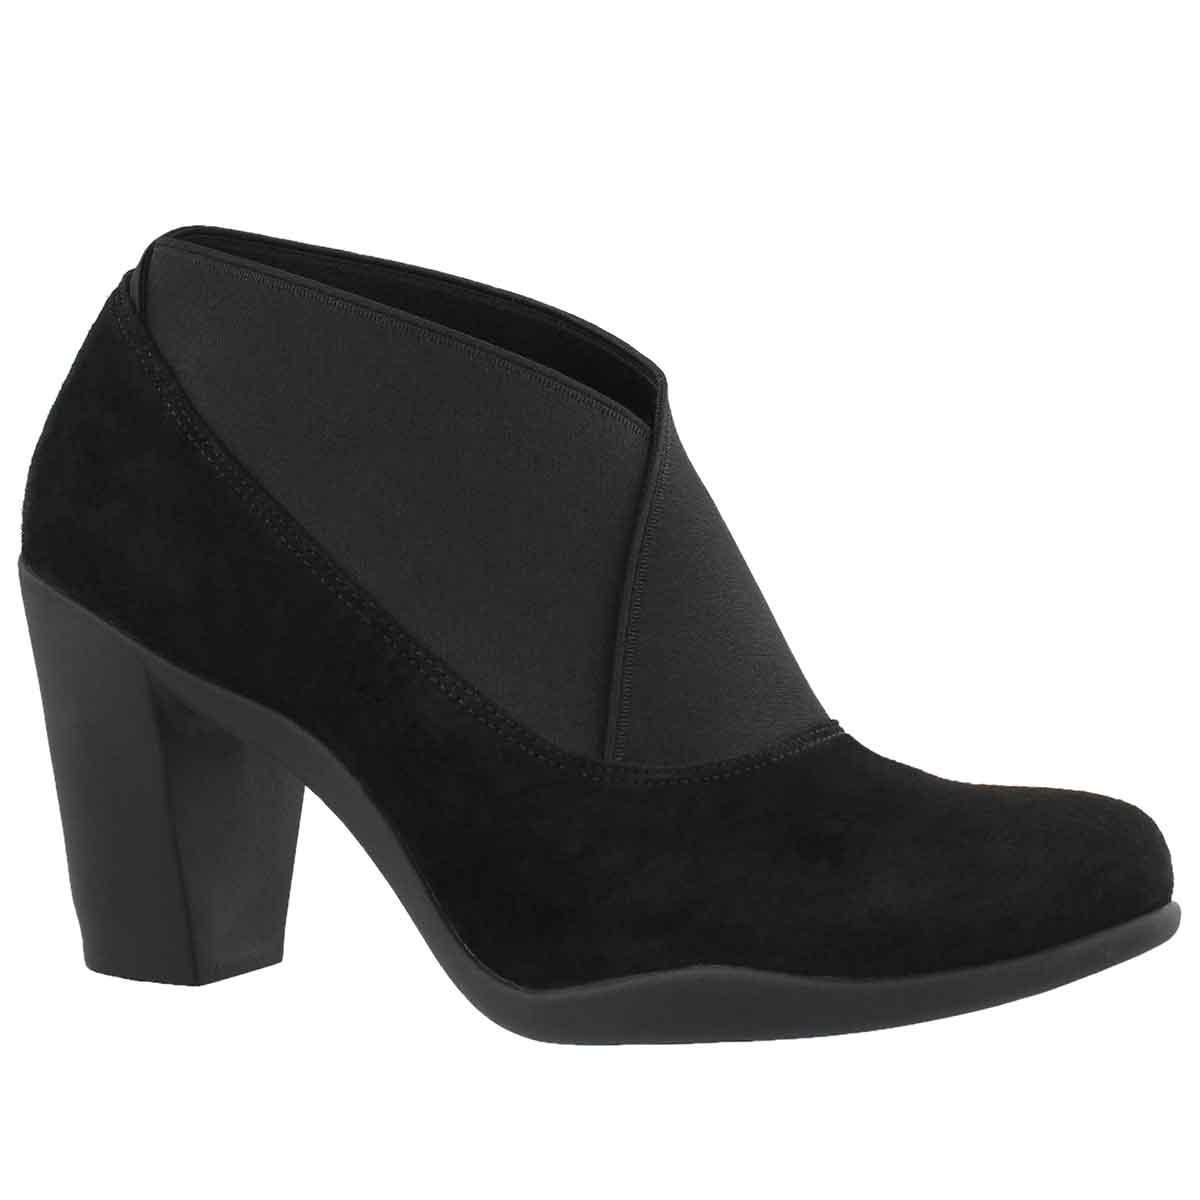 Women's ADYA LUNA black dress heels